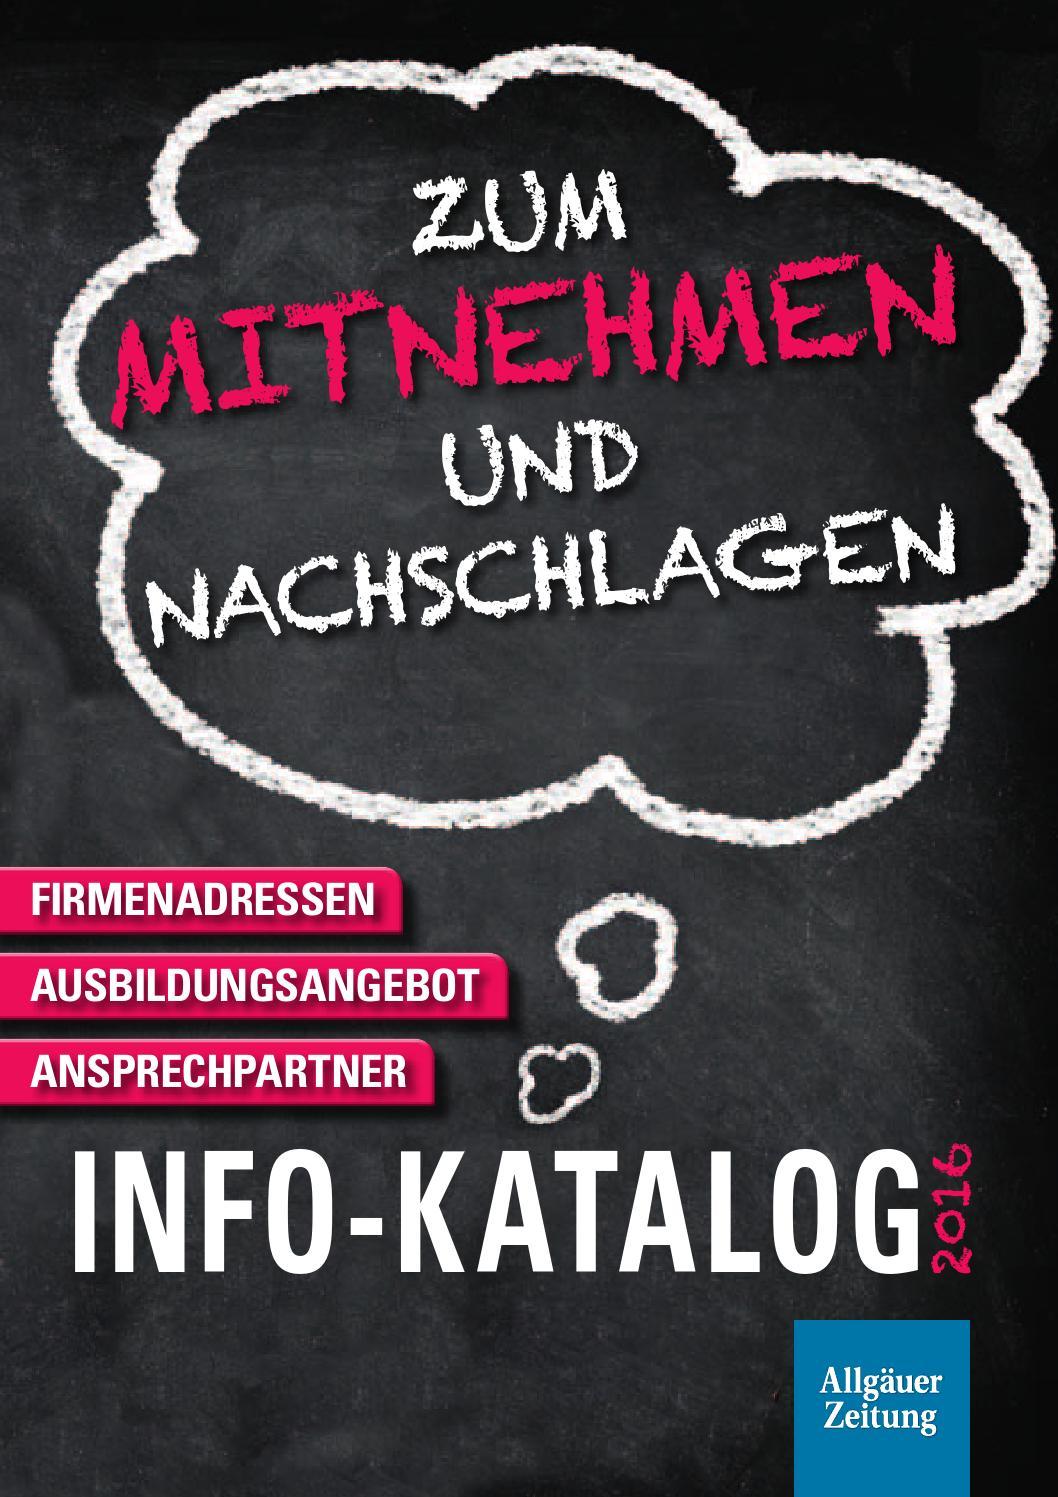 Lehrstellenbörse Info Katalog 2016 By Rtadesign Gmbh Issuu